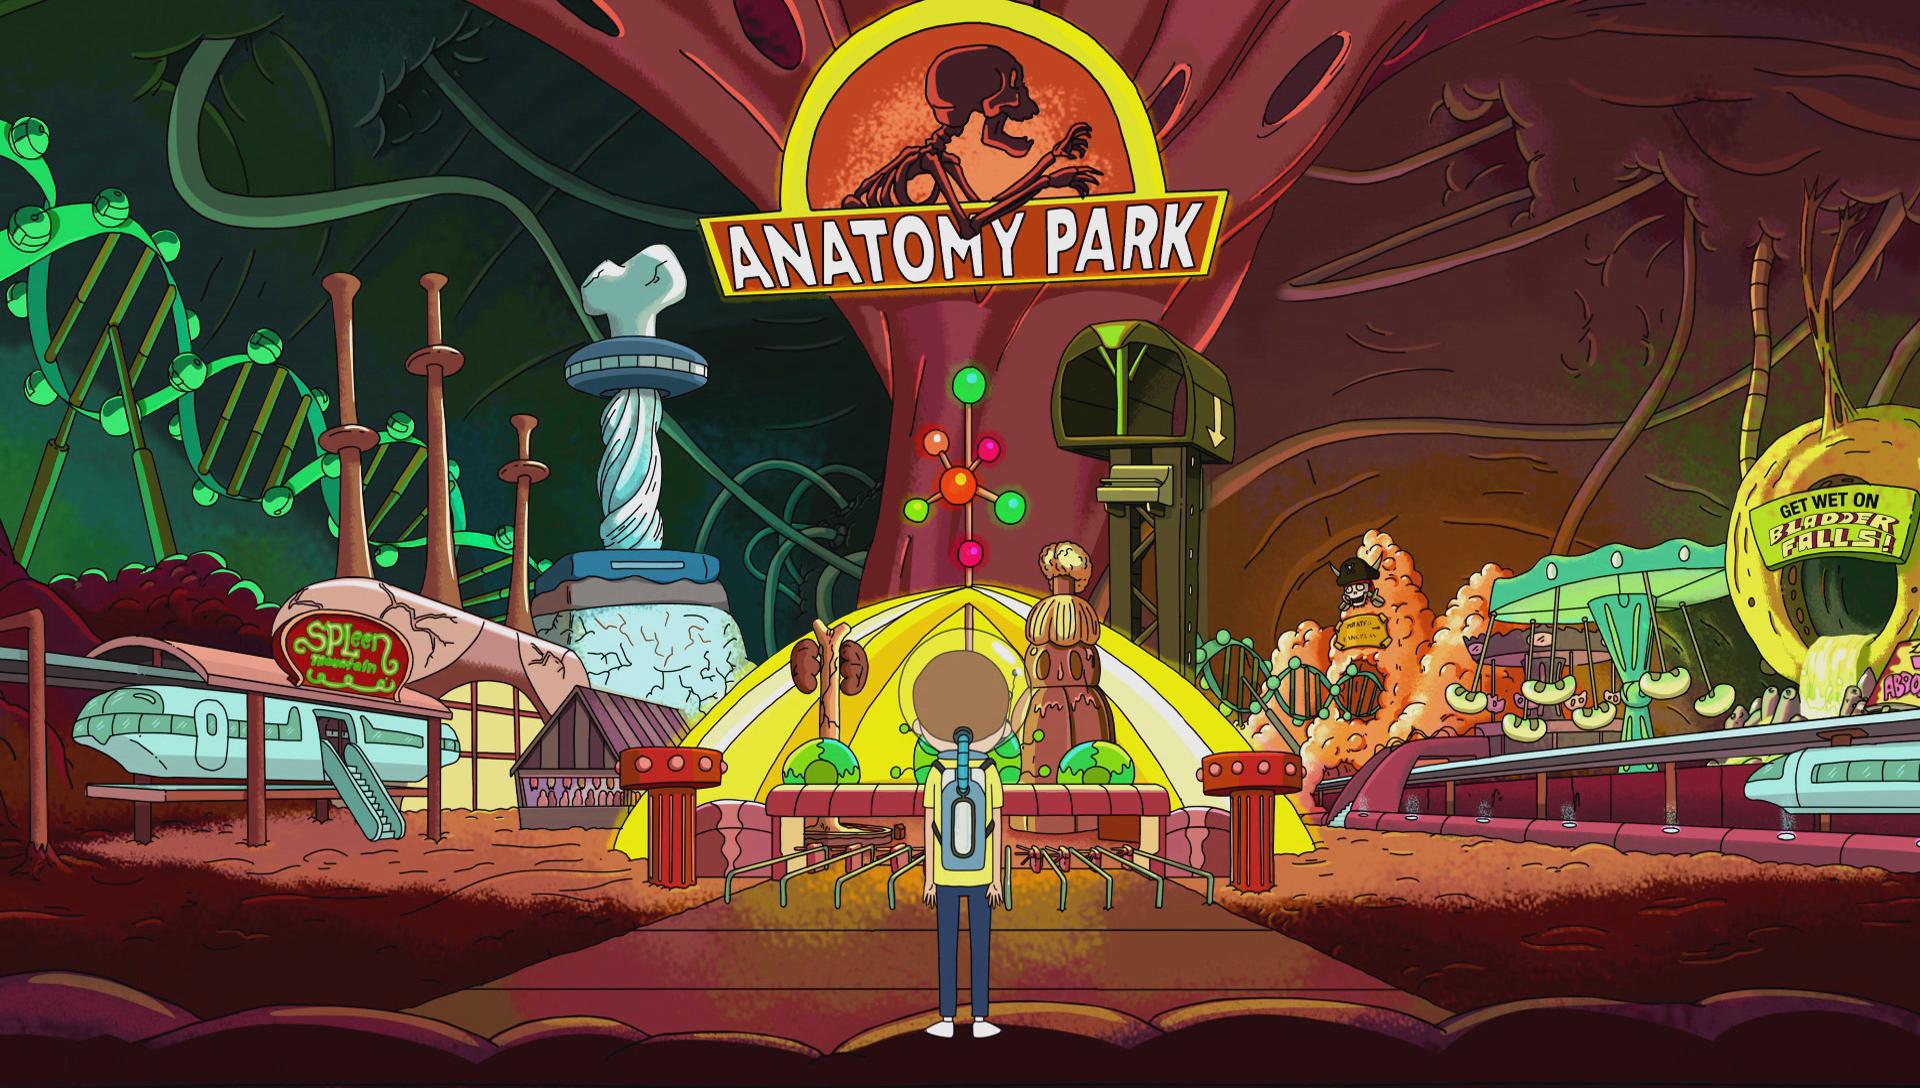 Anatomy Park (location)